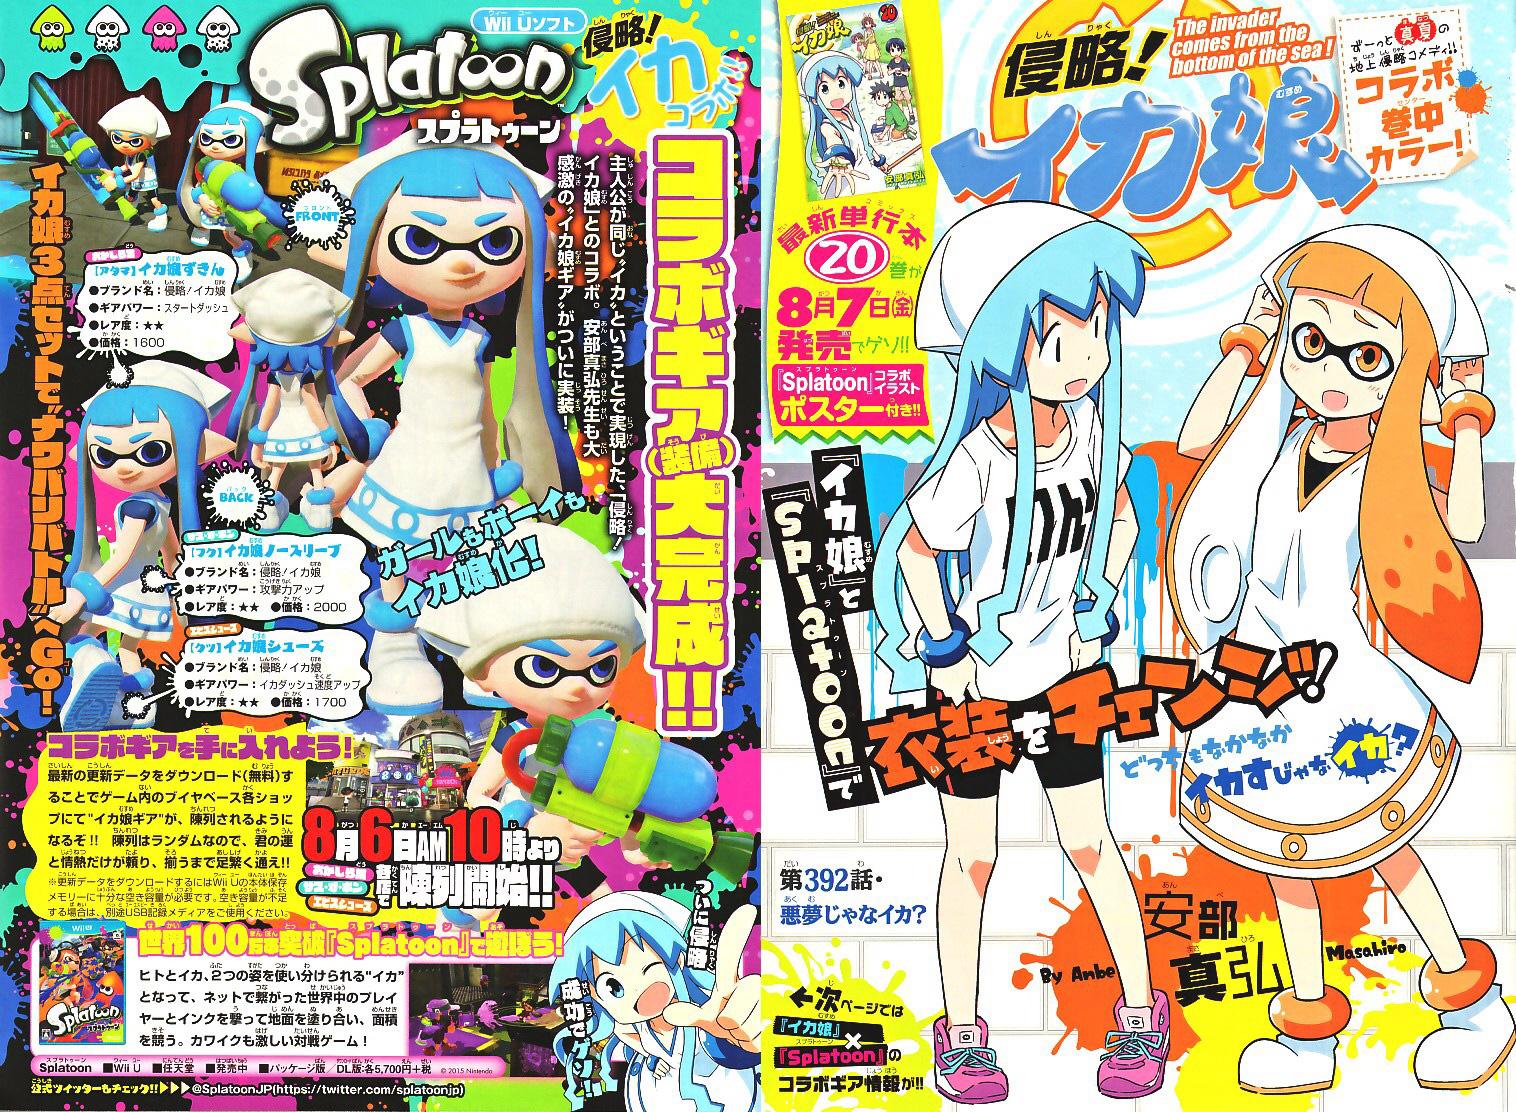 splatoon-costume-ika-musume